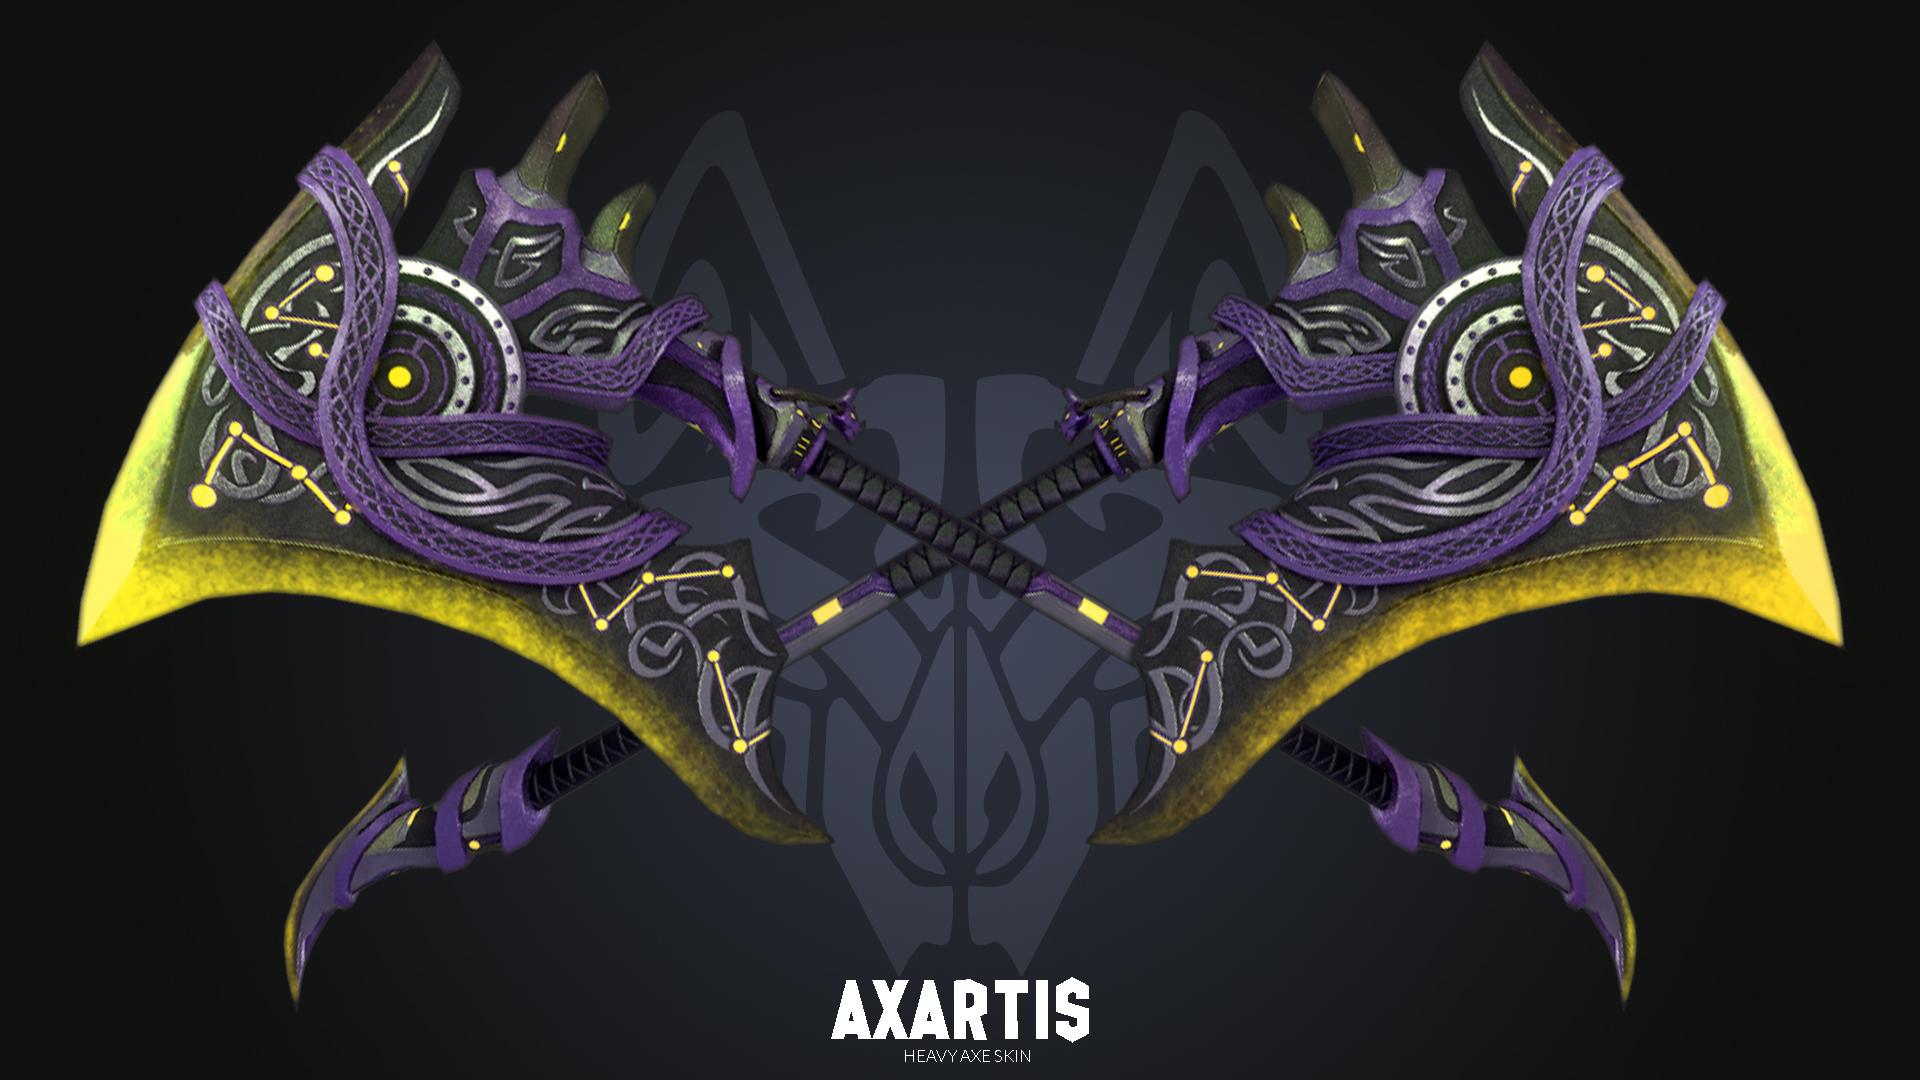 Axartis_Large_altcolour02.jpg